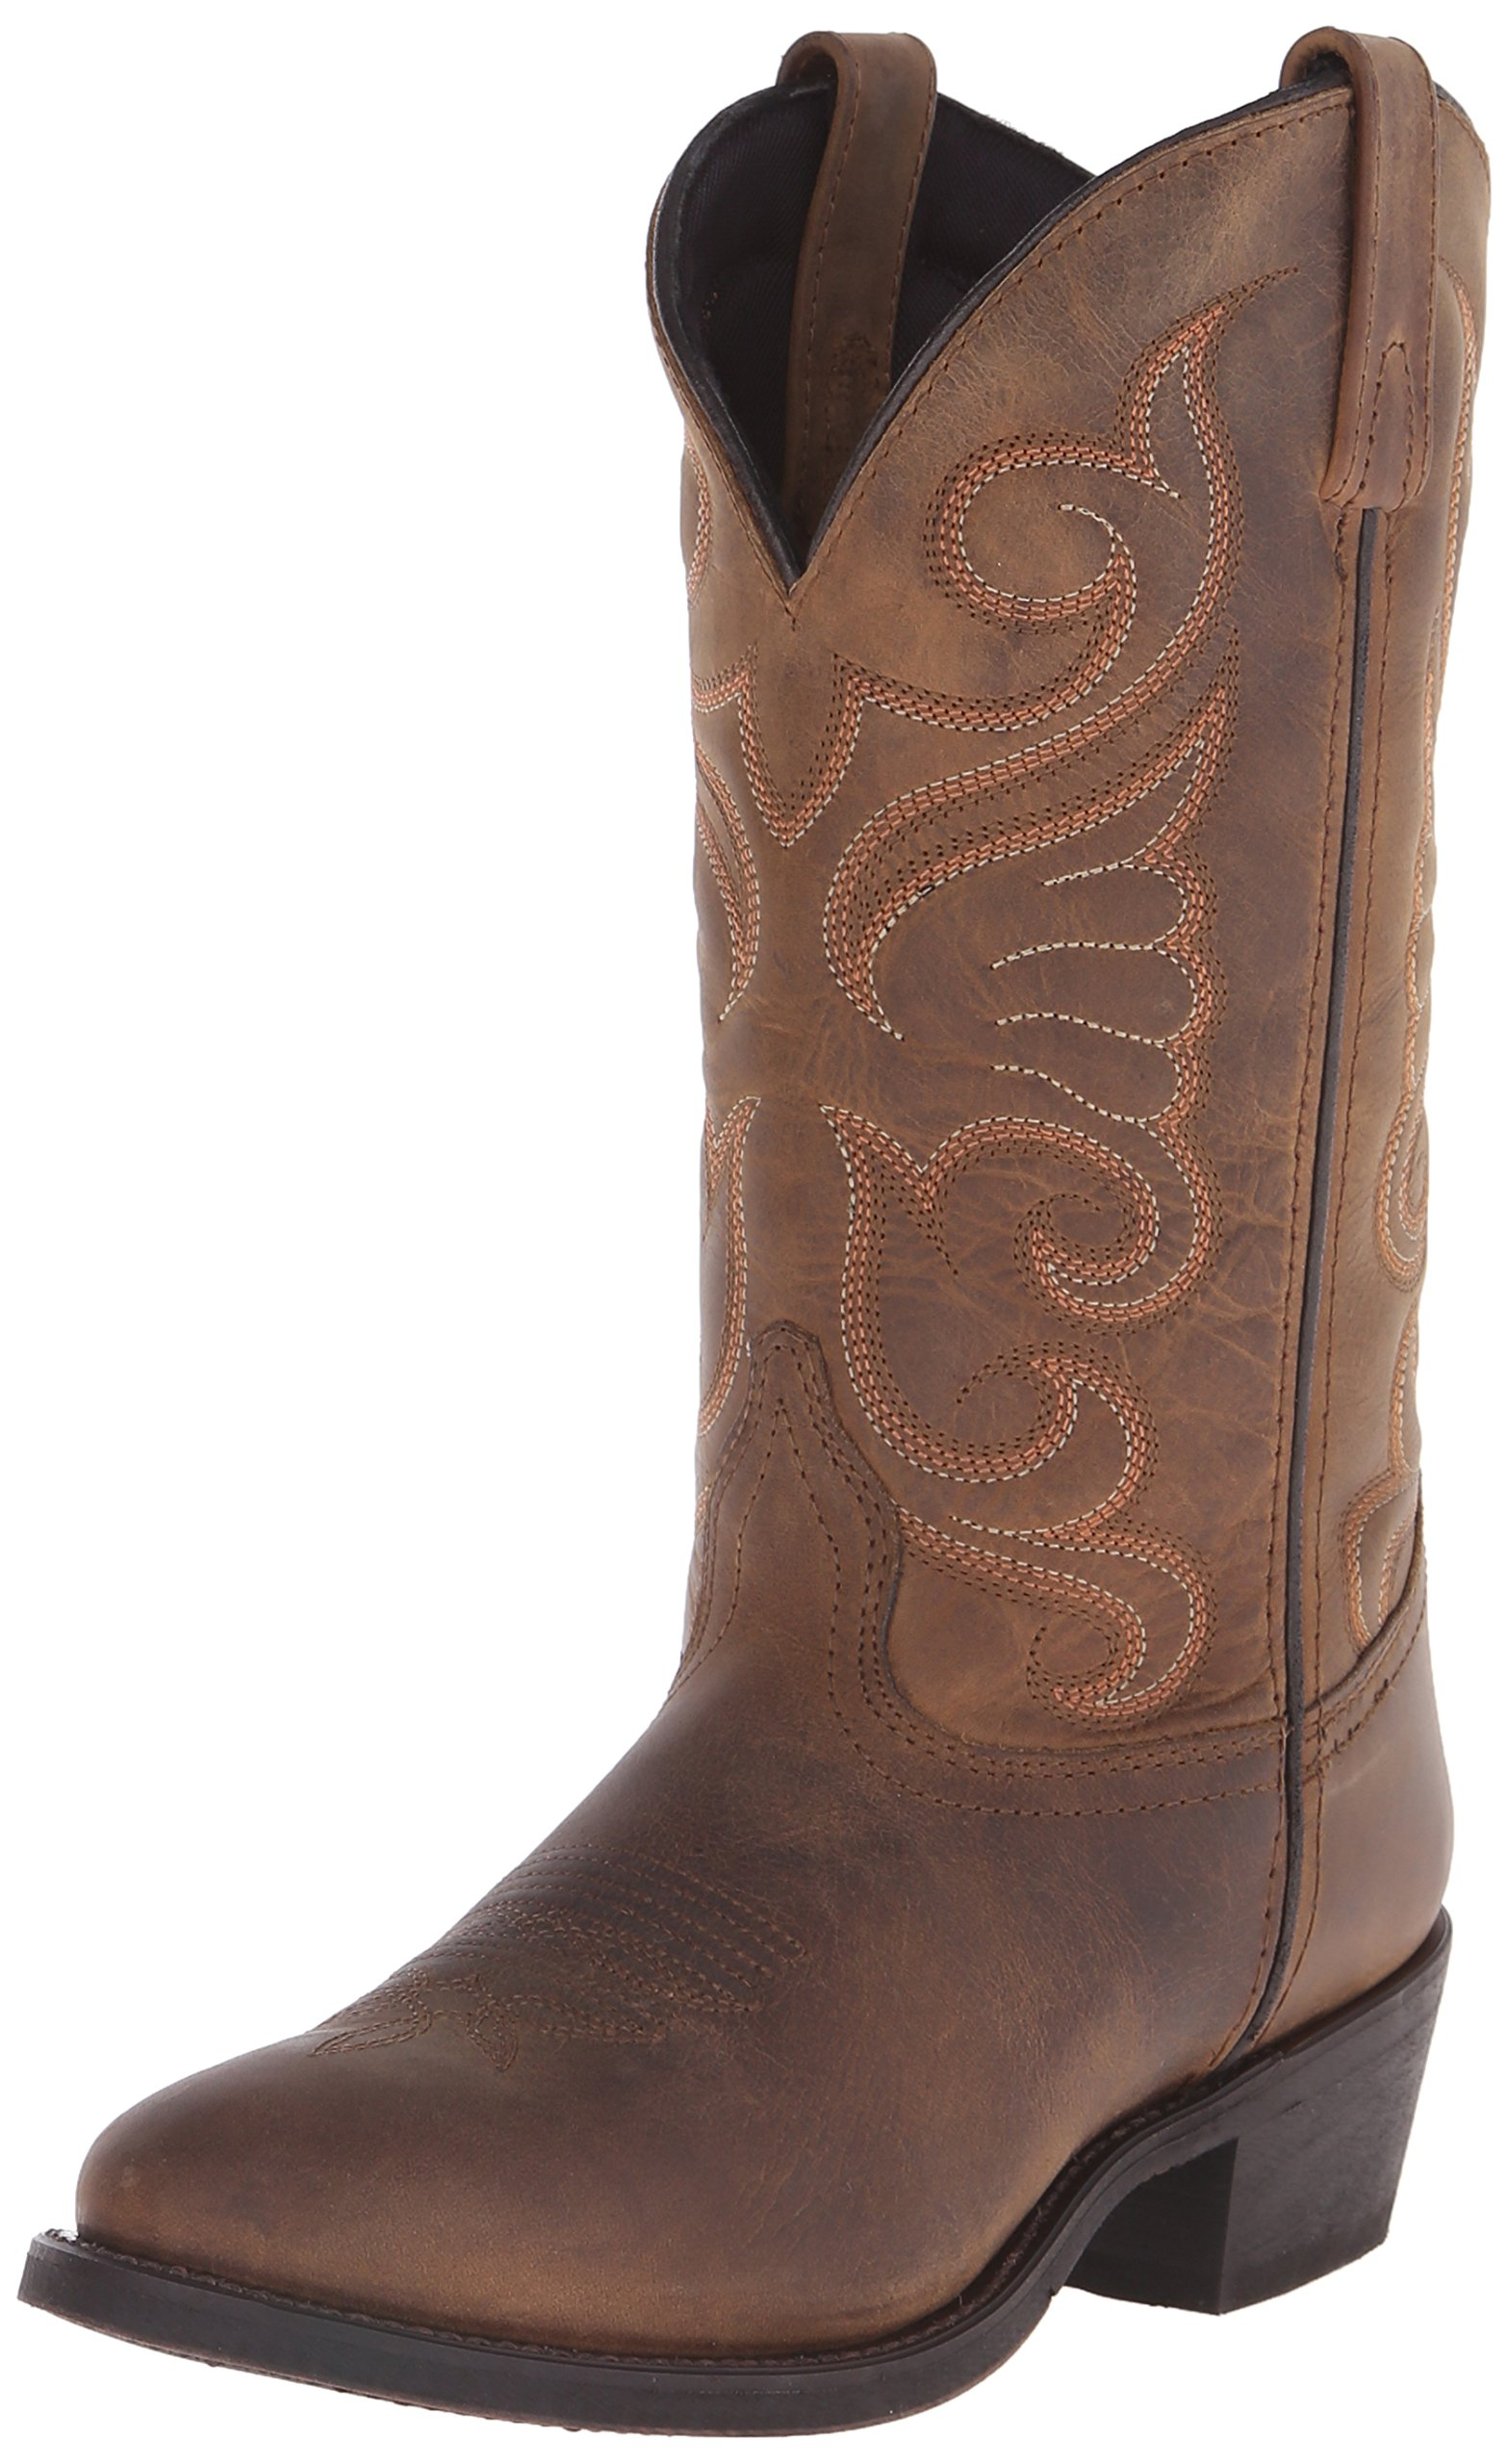 Laredo Women's Bridget Western Boot, Tan, 7.5 M US